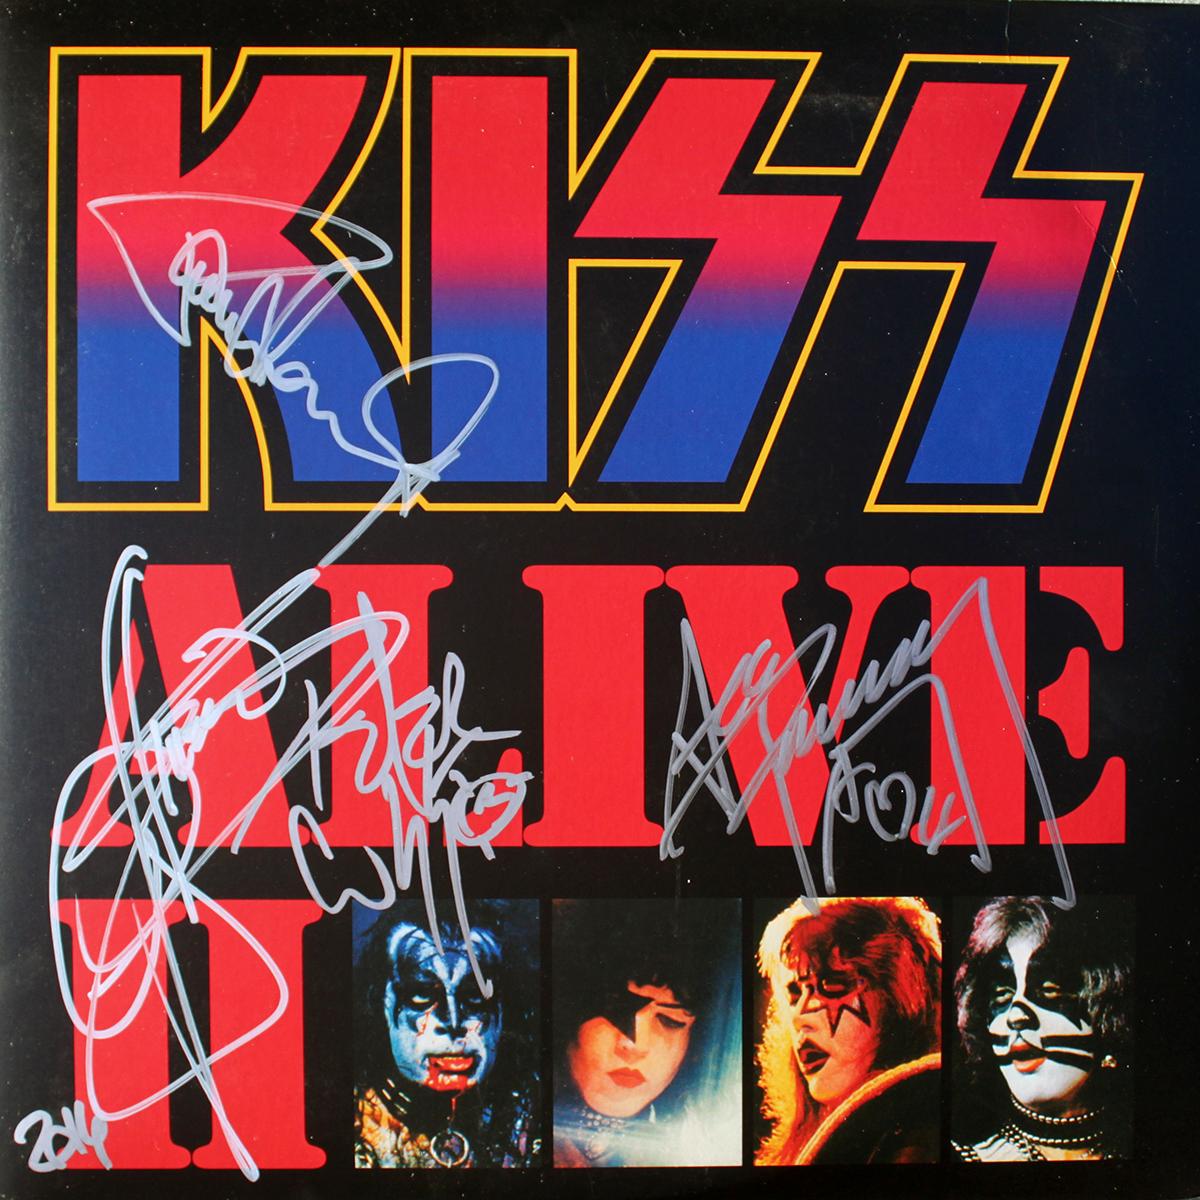 KISS - KISS Alive II